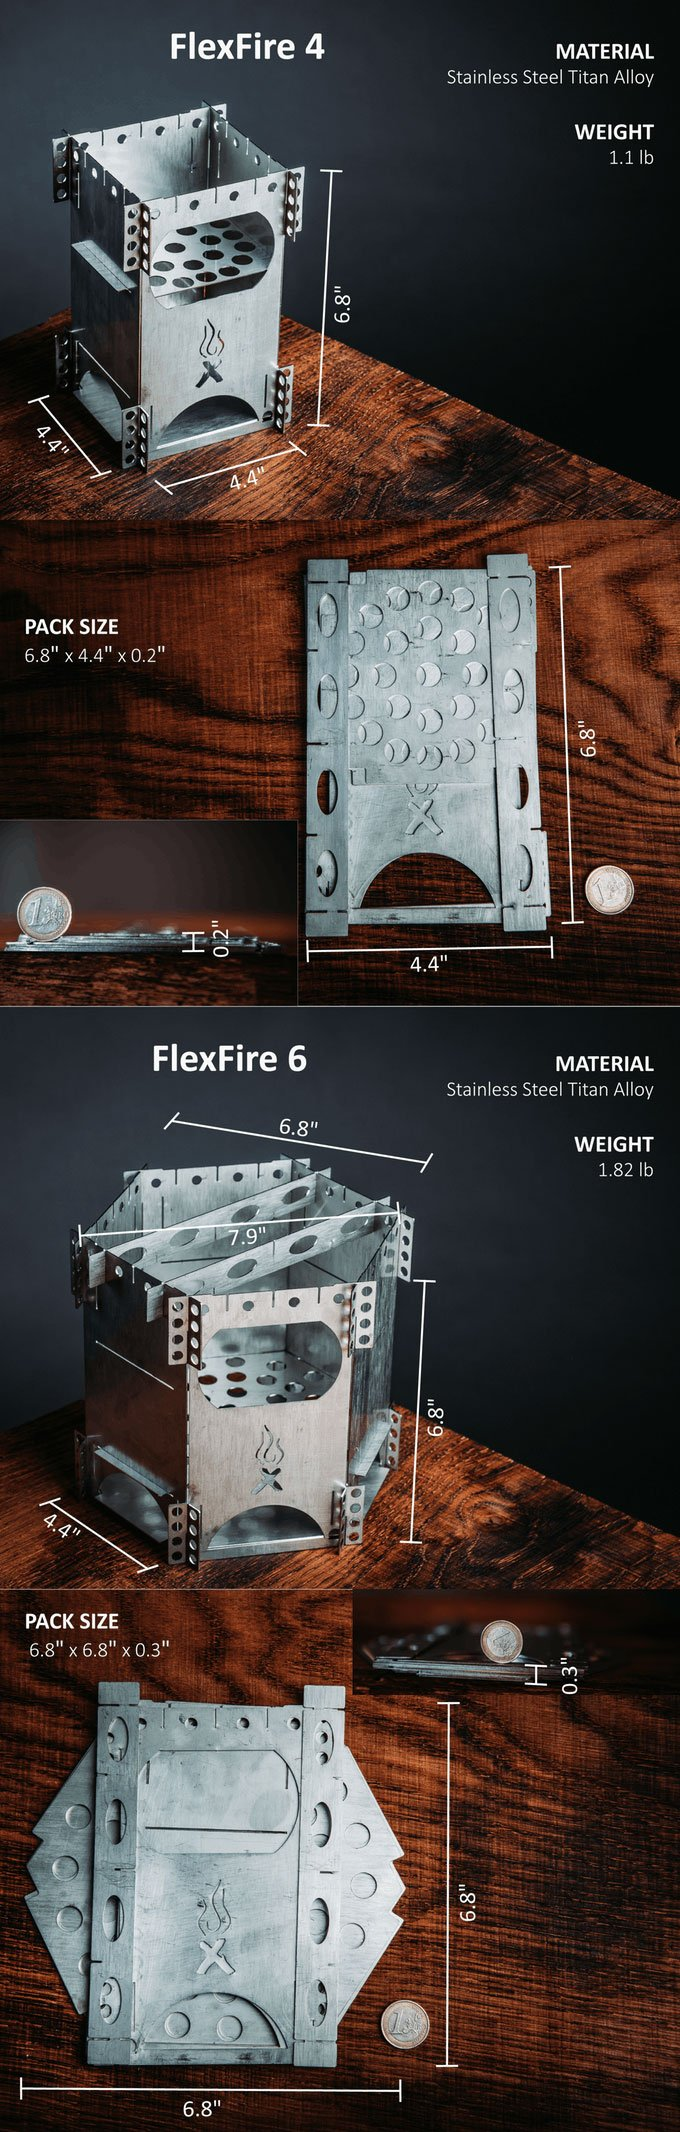 FlexFire Camping Stove